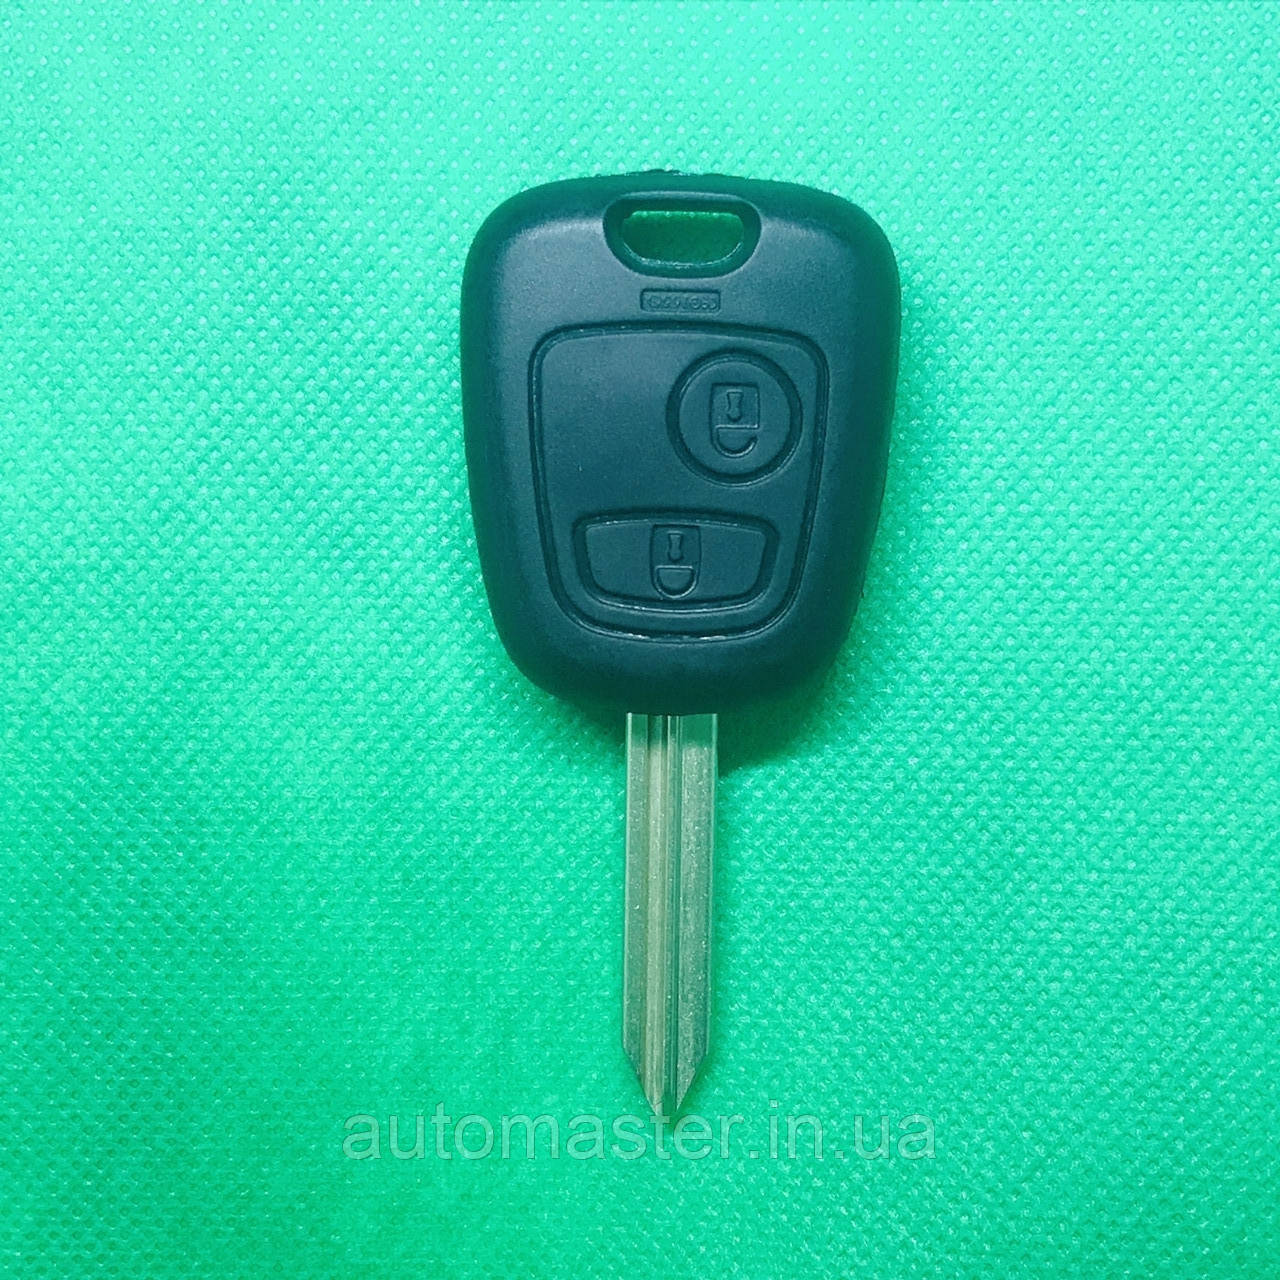 Корпус авто ключа для Peugeot Partner (Пежо Партнер) 2 - кнопки, лезвие SX 9